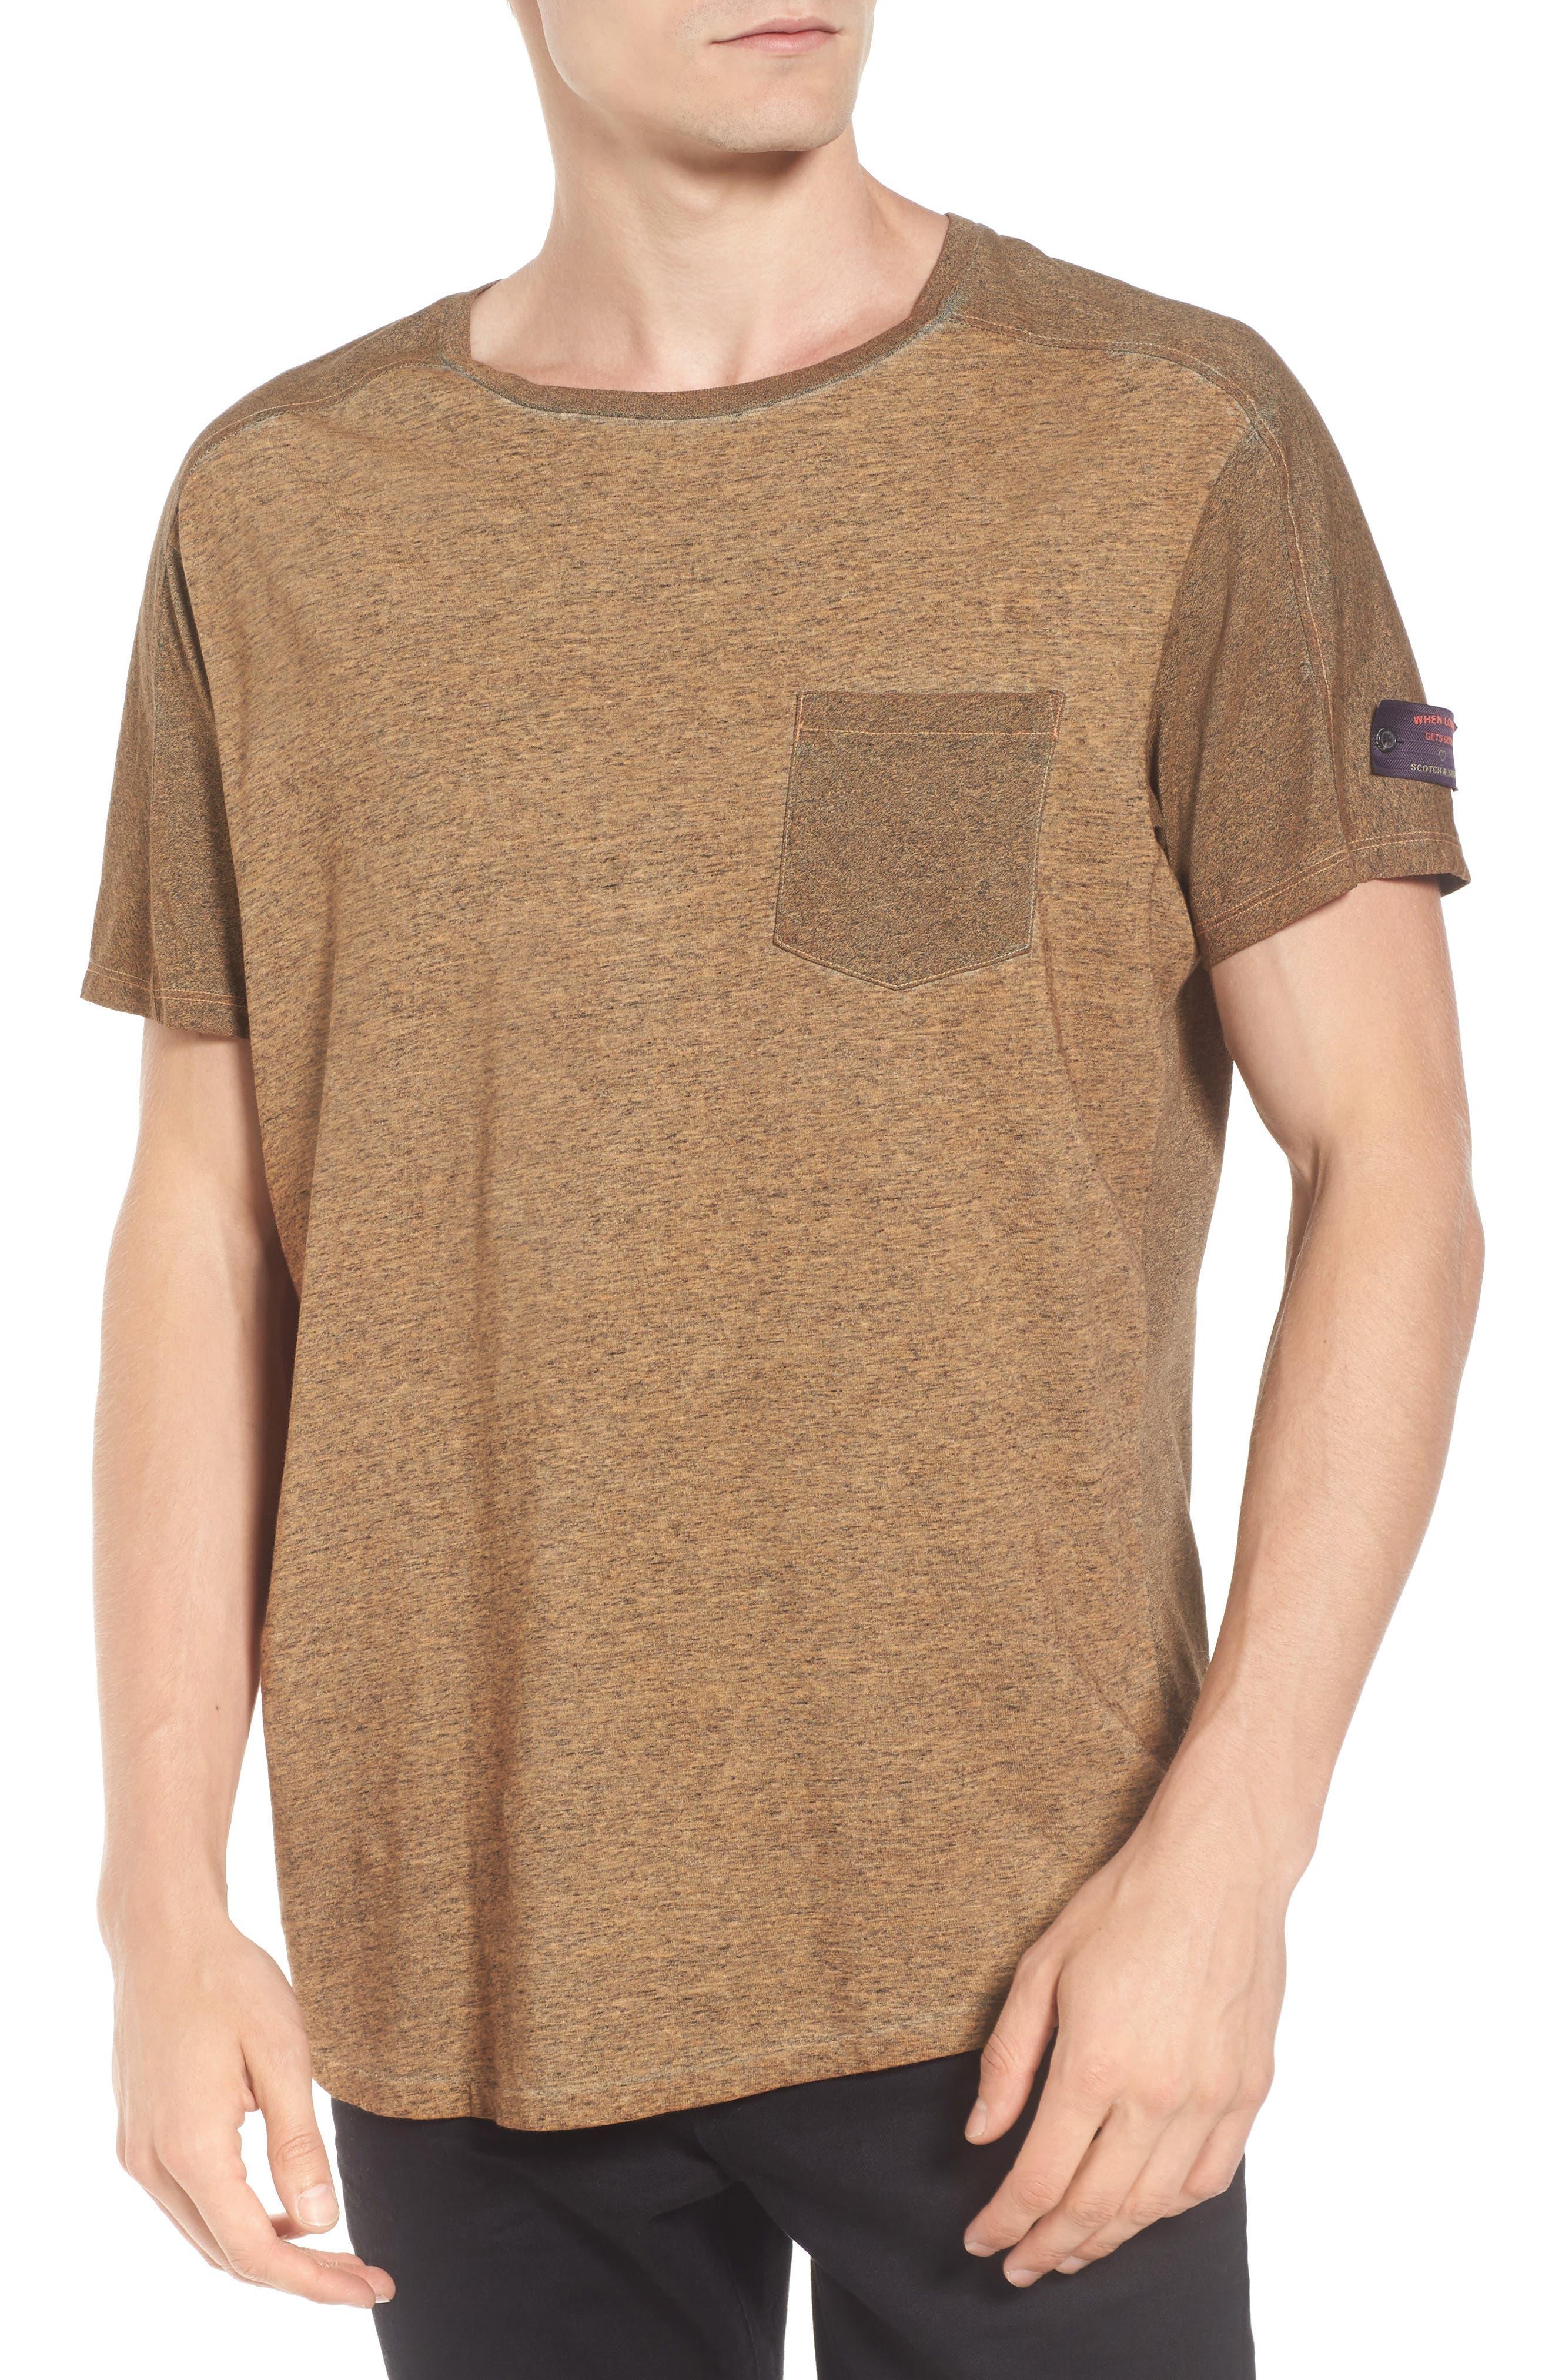 Oil-Washed Pocket T-Shirt,                             Main thumbnail 1, color,                             Ginger